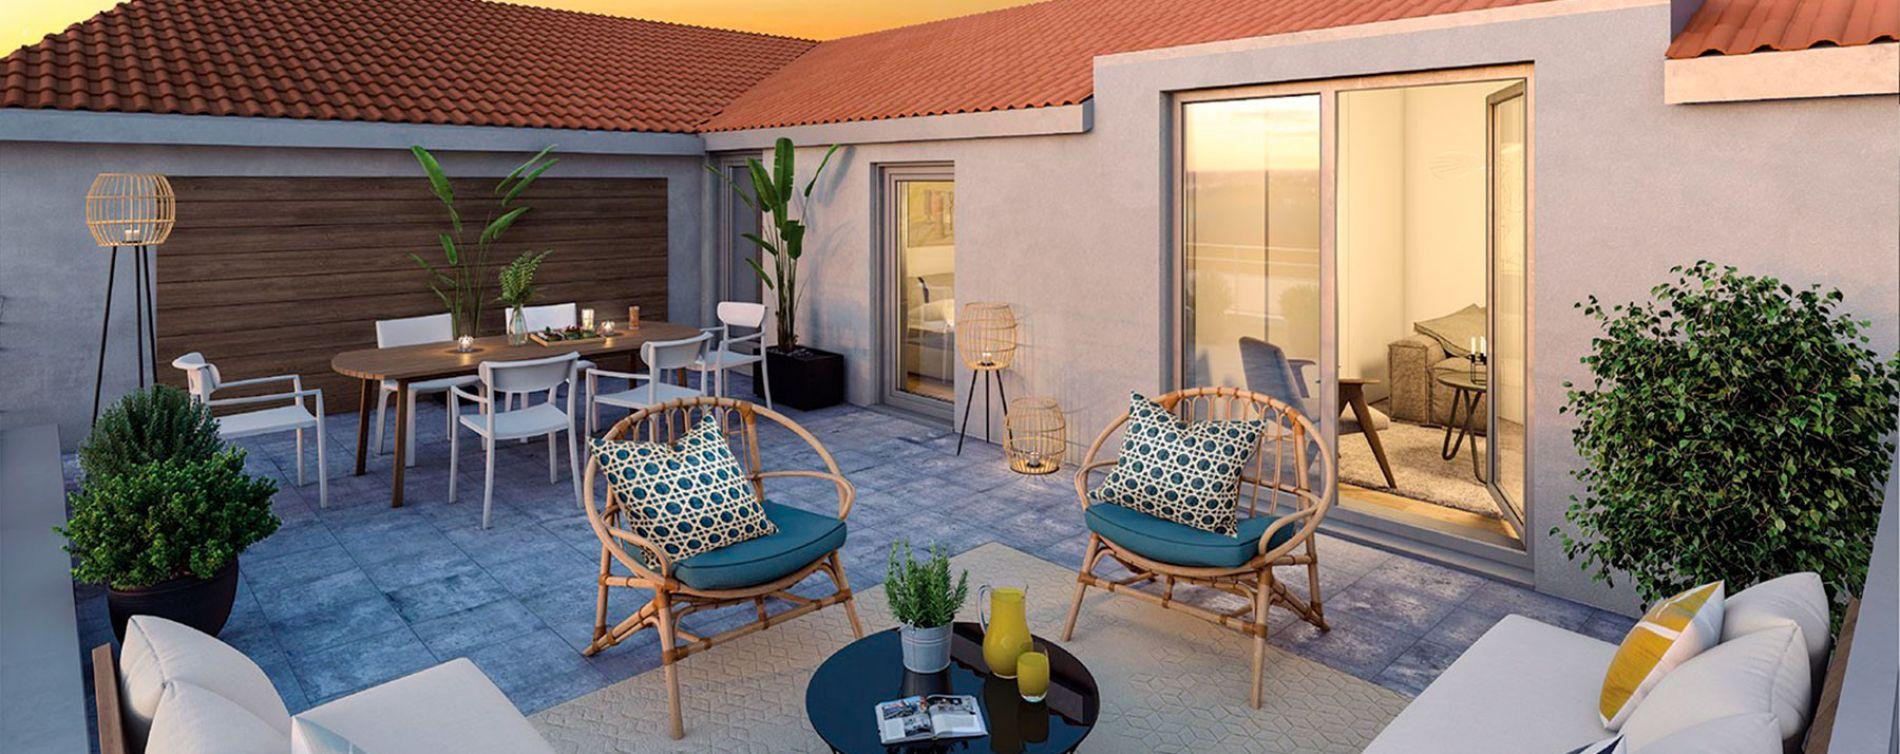 Neuilly-sur-Marne : programme immobilier neuve « Côté Jardin » (3)